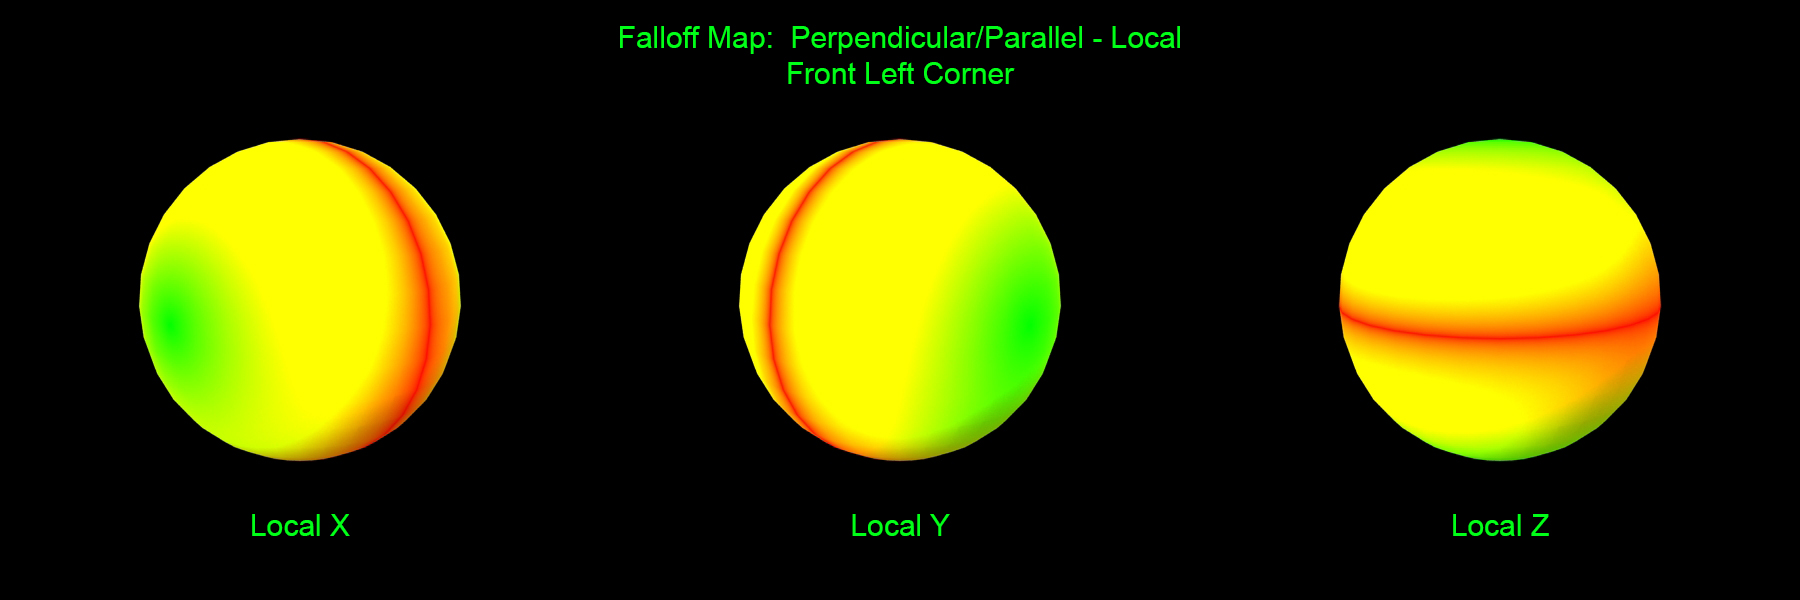 FalloffDirection_Local